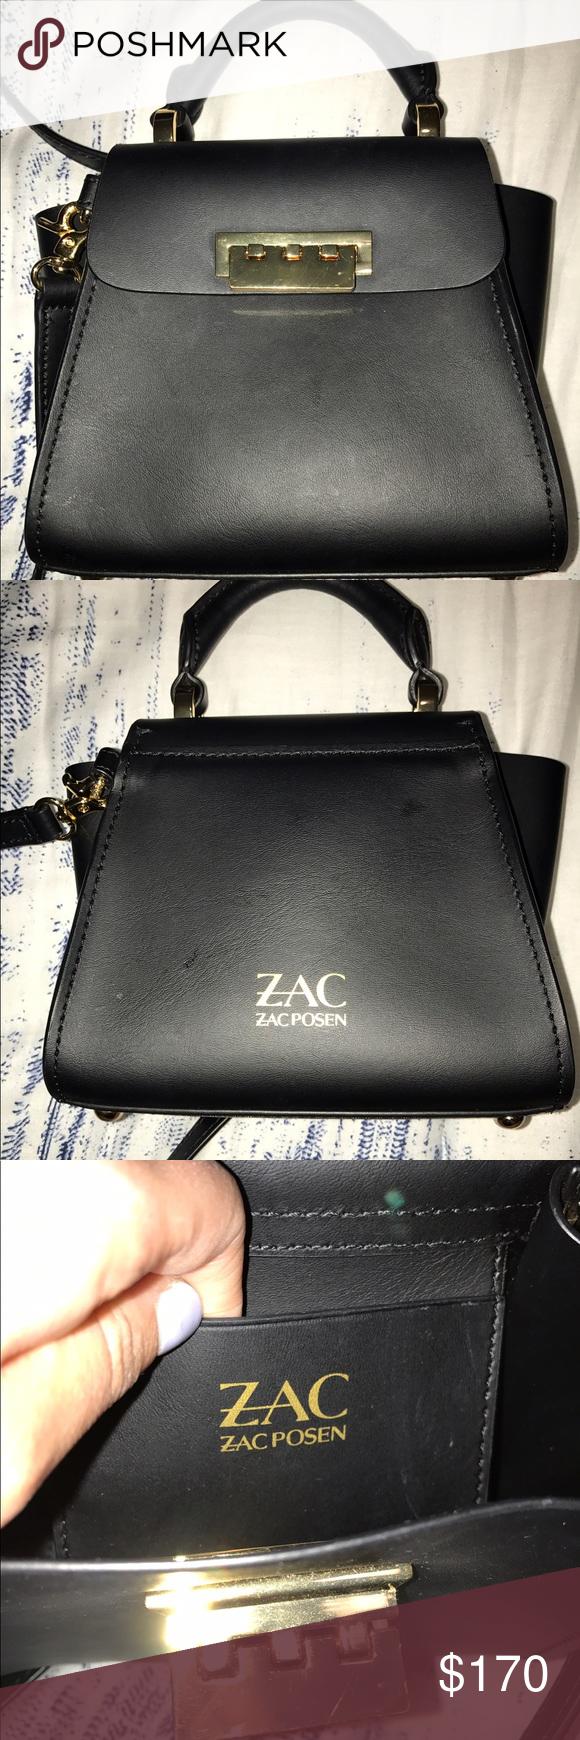 Zac Zac Posen Mini Eartha Iconic He Multi Purpose Handbag